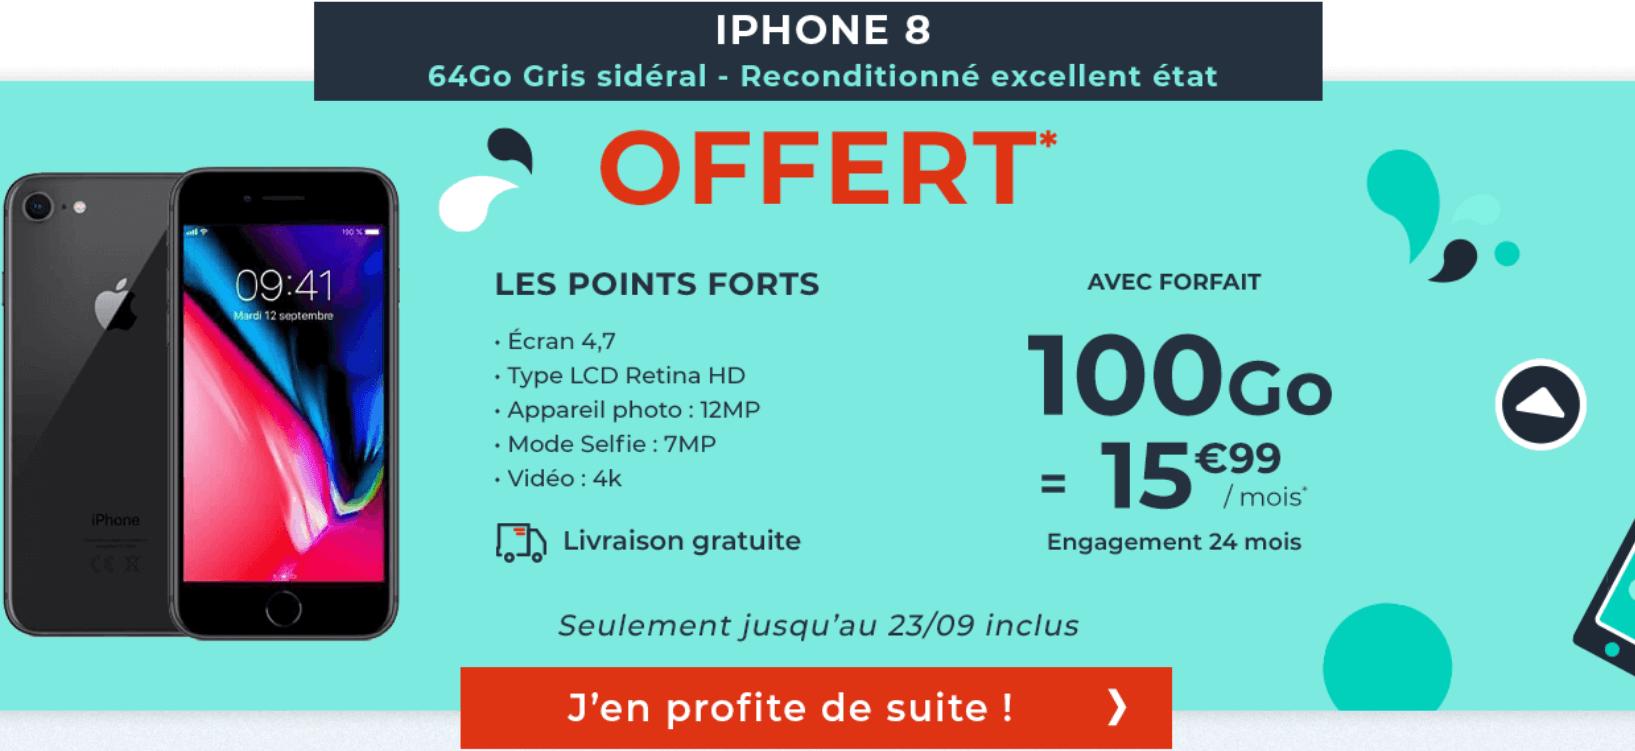 Forfaits mobiles Cdiscount avec iPhone 8 en promo